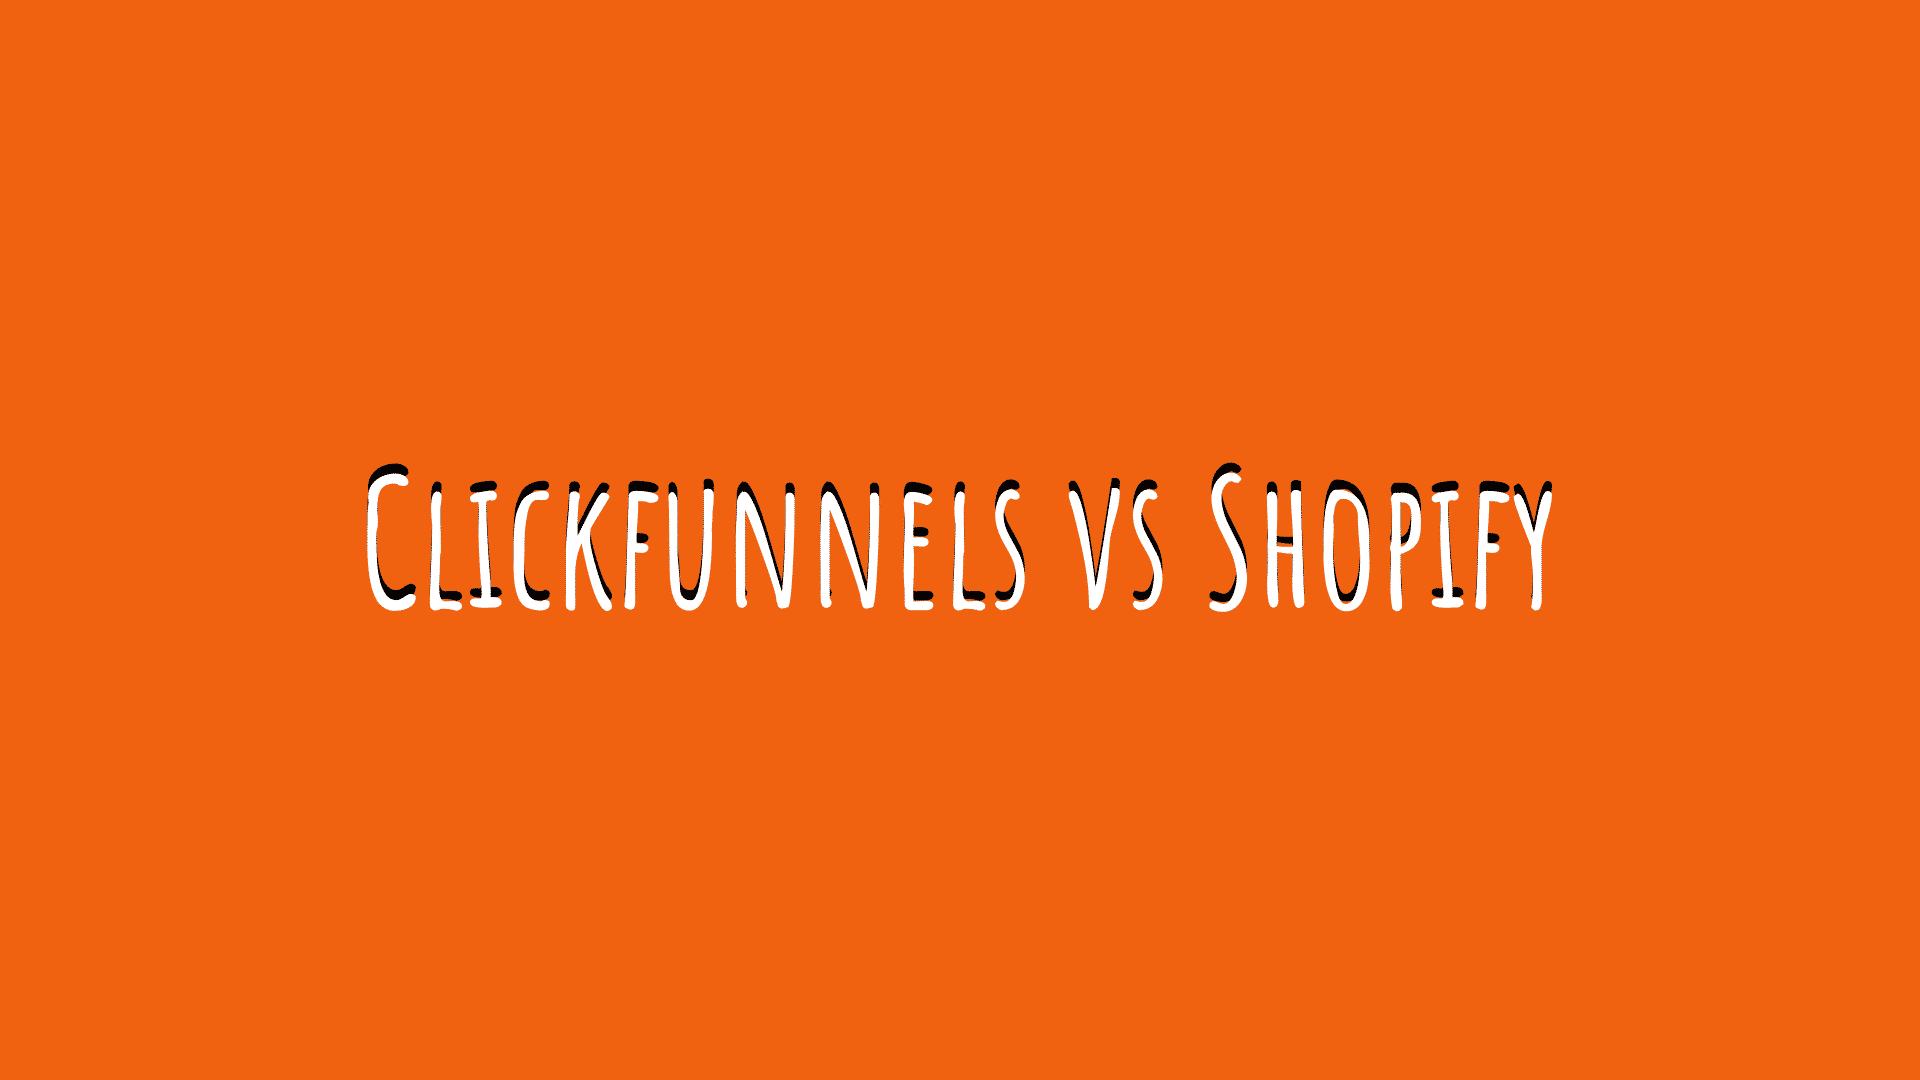 Clickfunnels vs Shopify